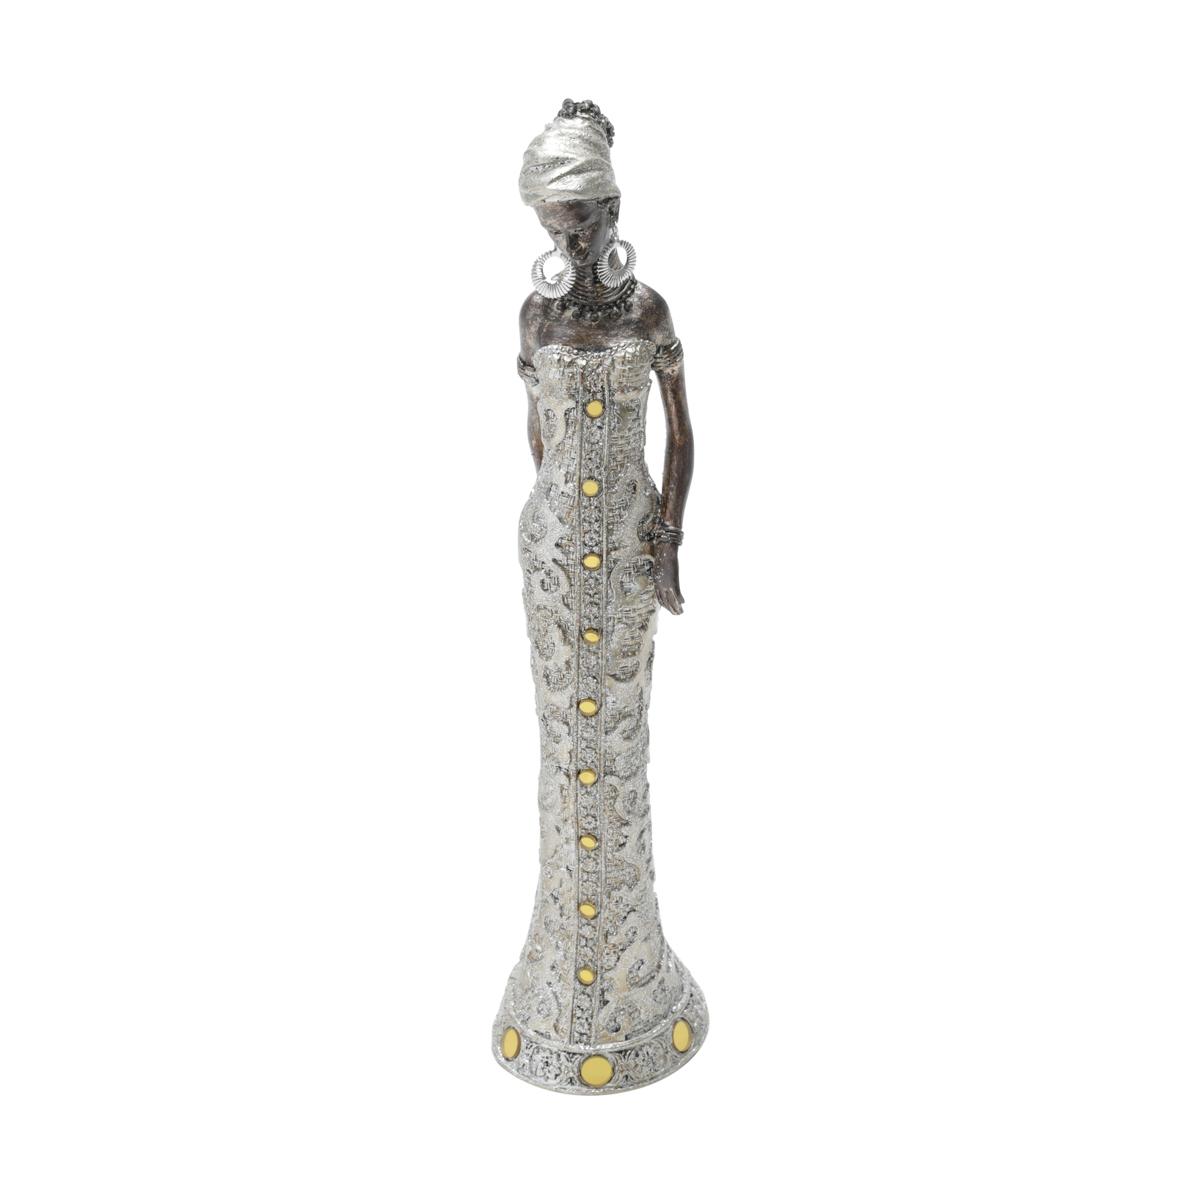 Africana Decorativa de Resina Roupa Dourada 27cm